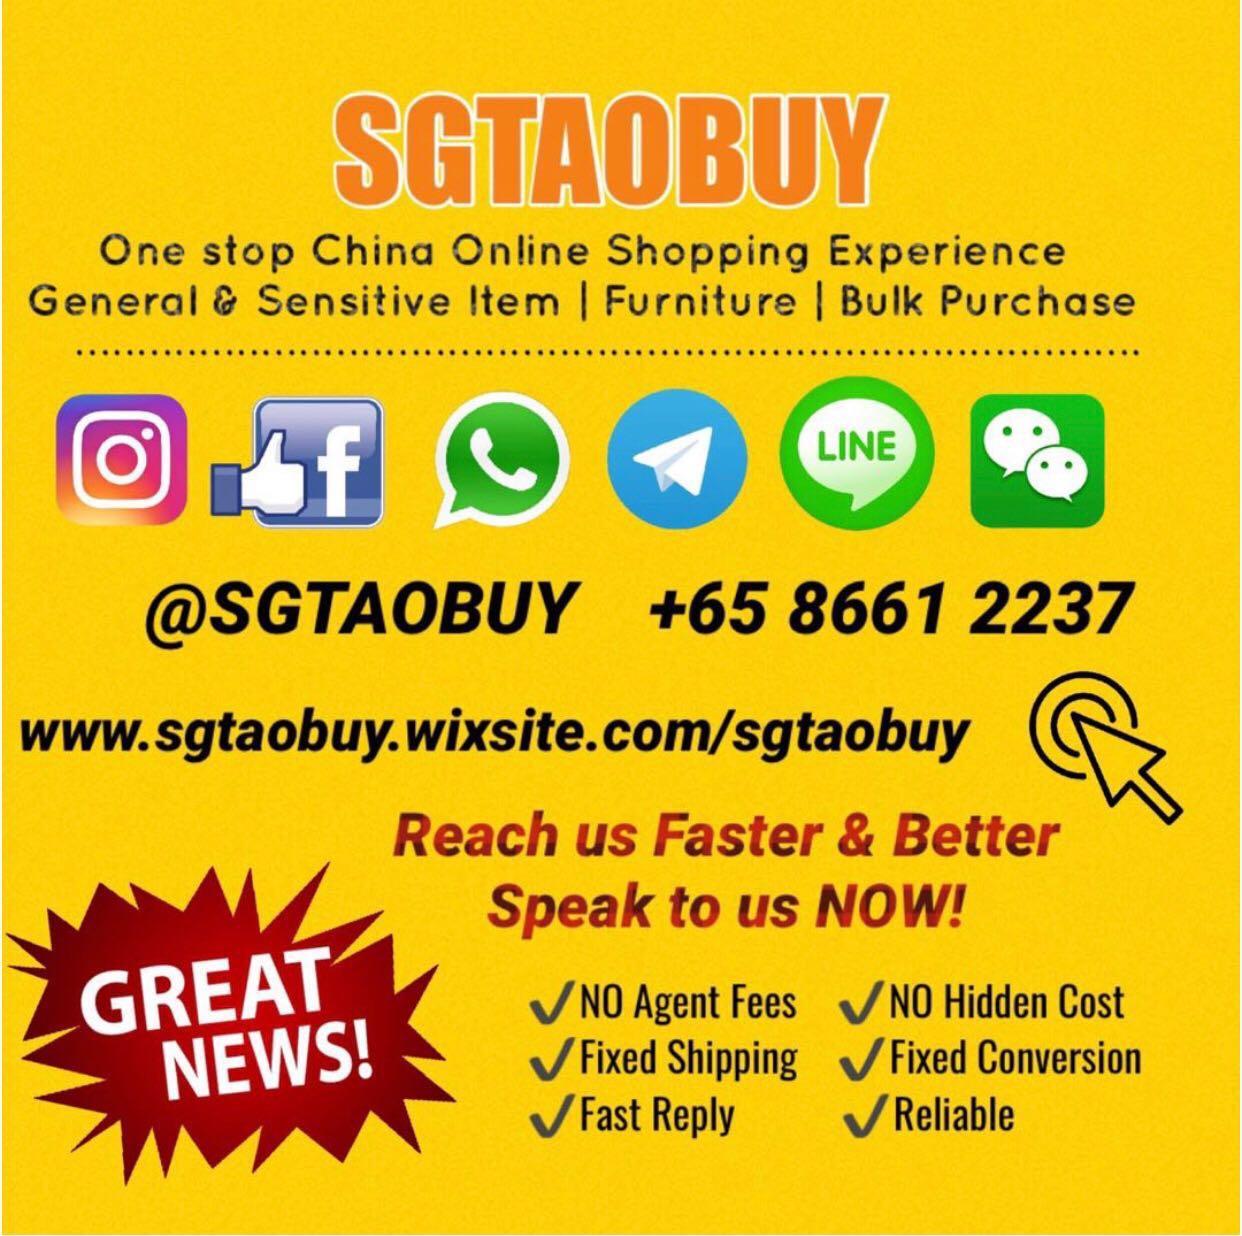 3098e9f0 Taobao Agent / Taobao Helper / Shipping / Furniture 淘宝, Everything ...